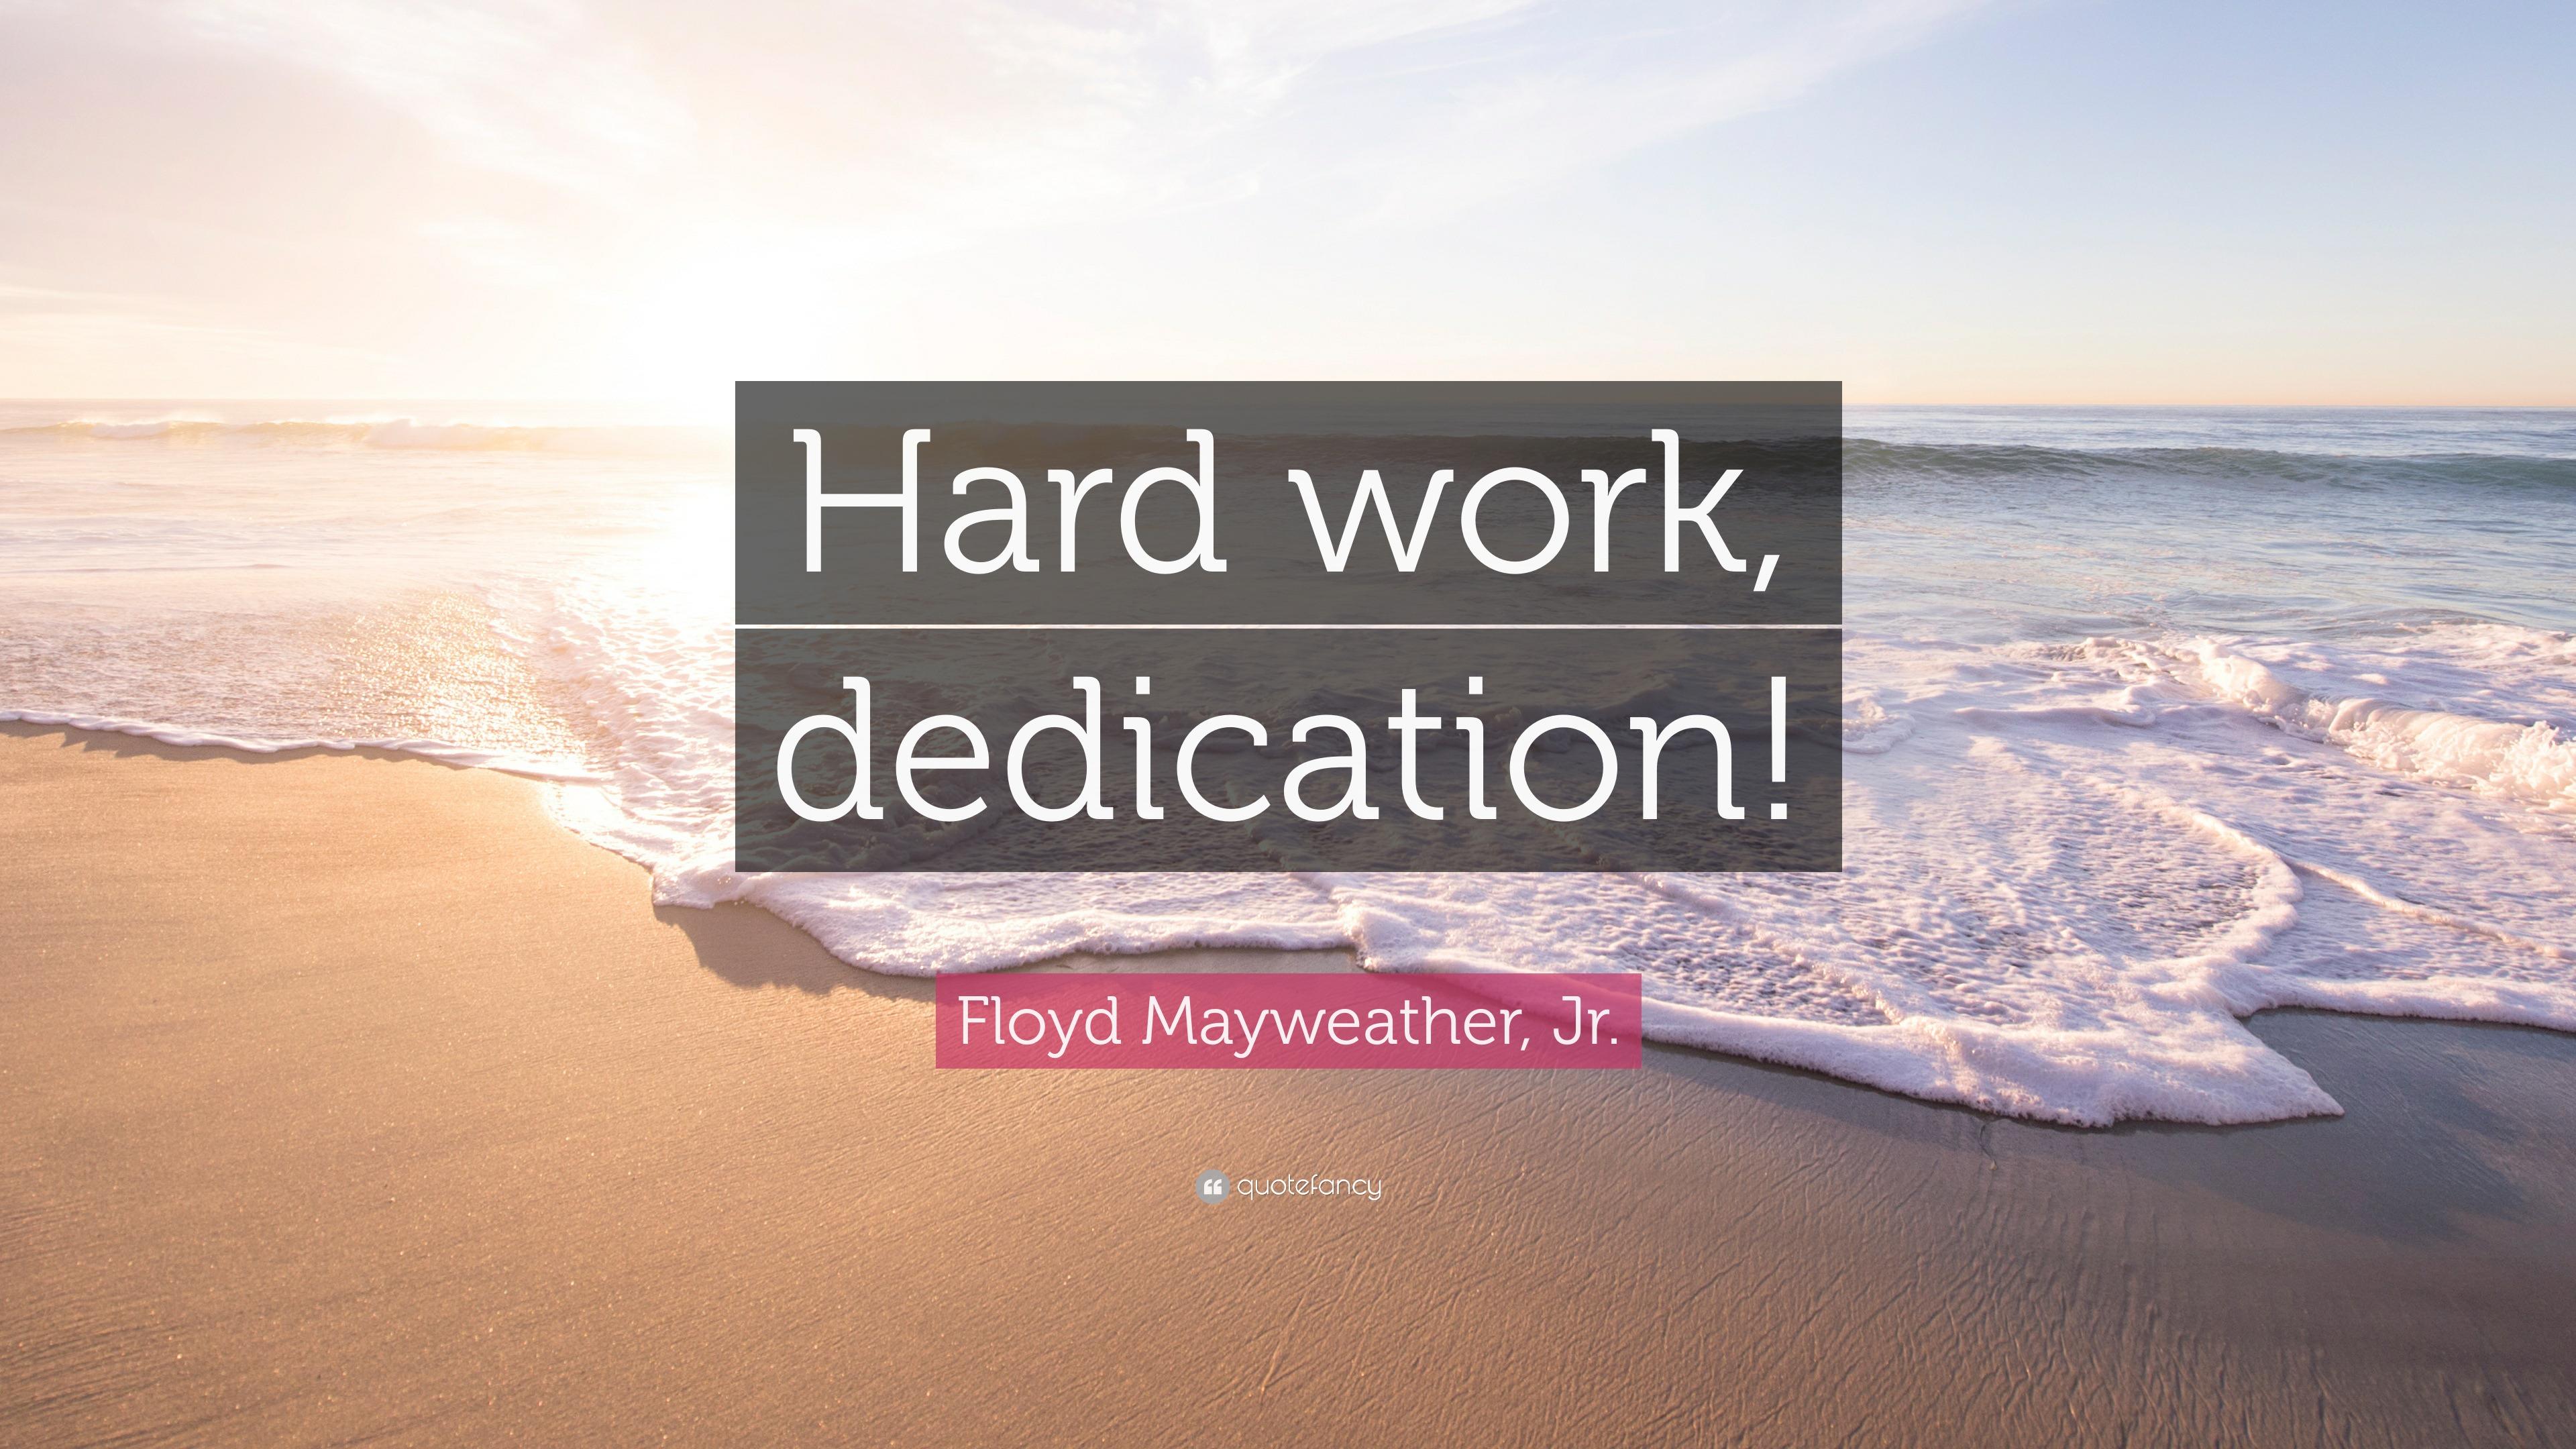 Floyd mayweather jr quote hard work dedication 12 wallpapers floyd mayweather jr quote hard work dedication altavistaventures Image collections